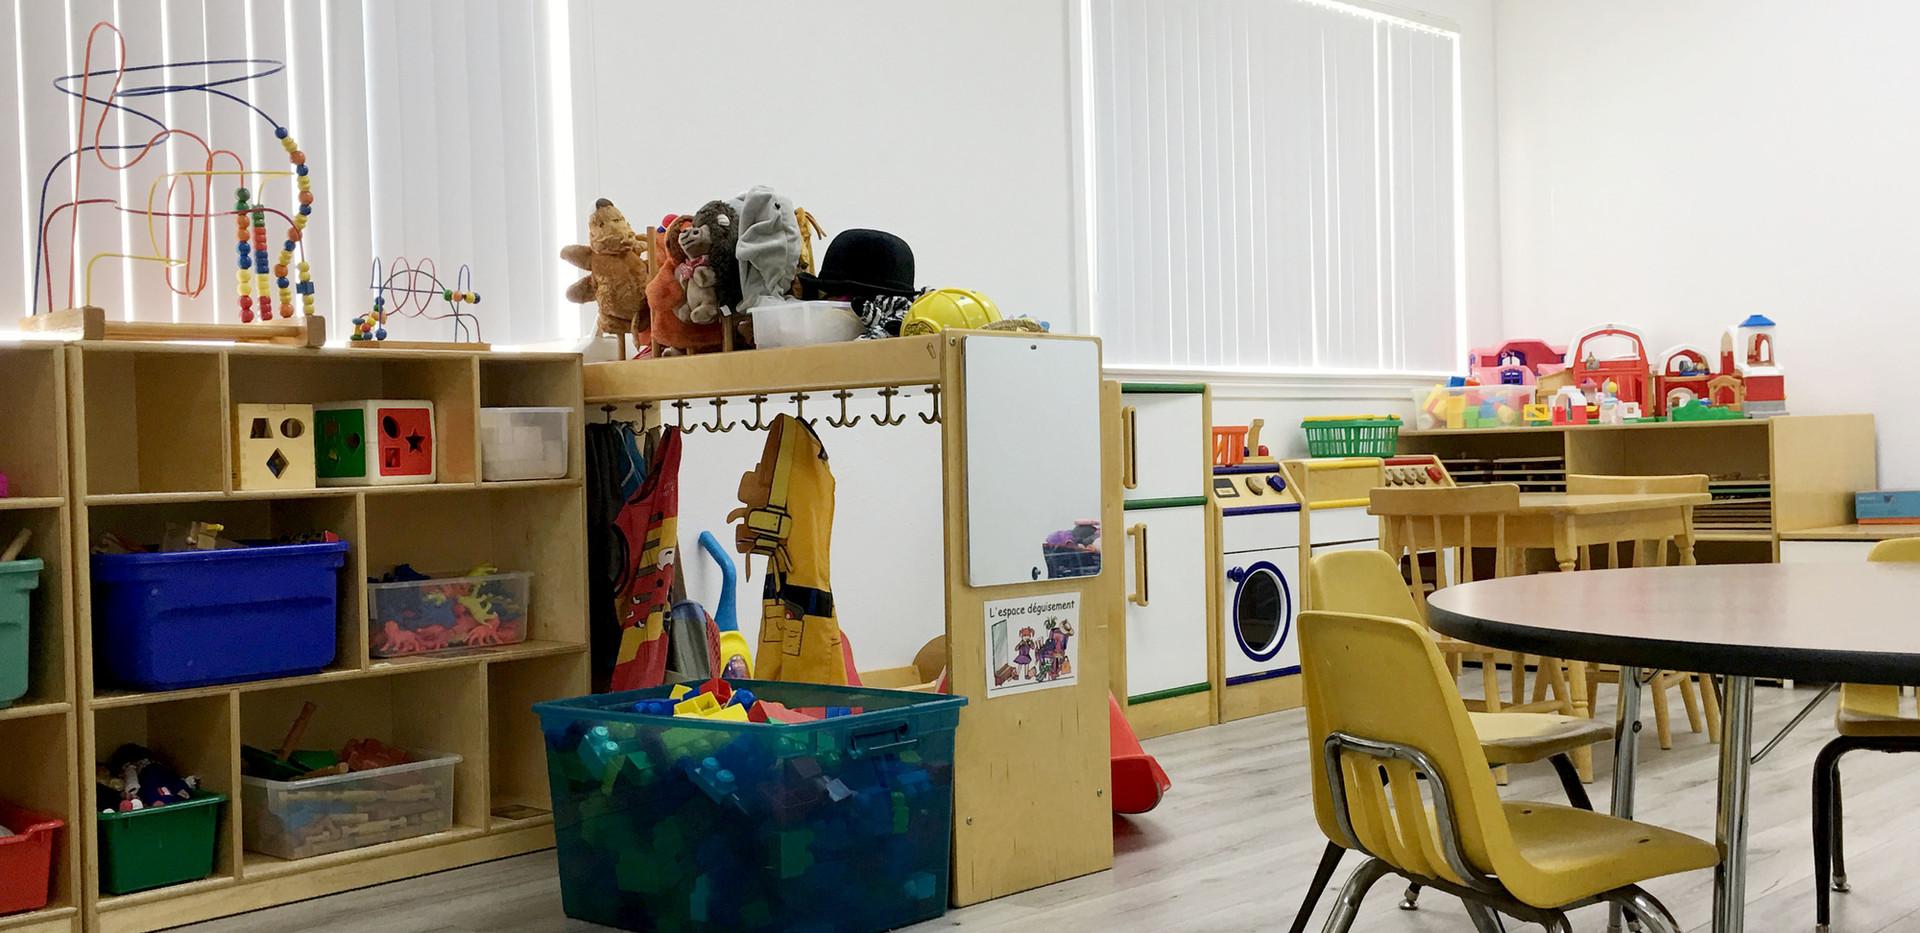 facilities_0024_IMG_0613.JPG.jpg